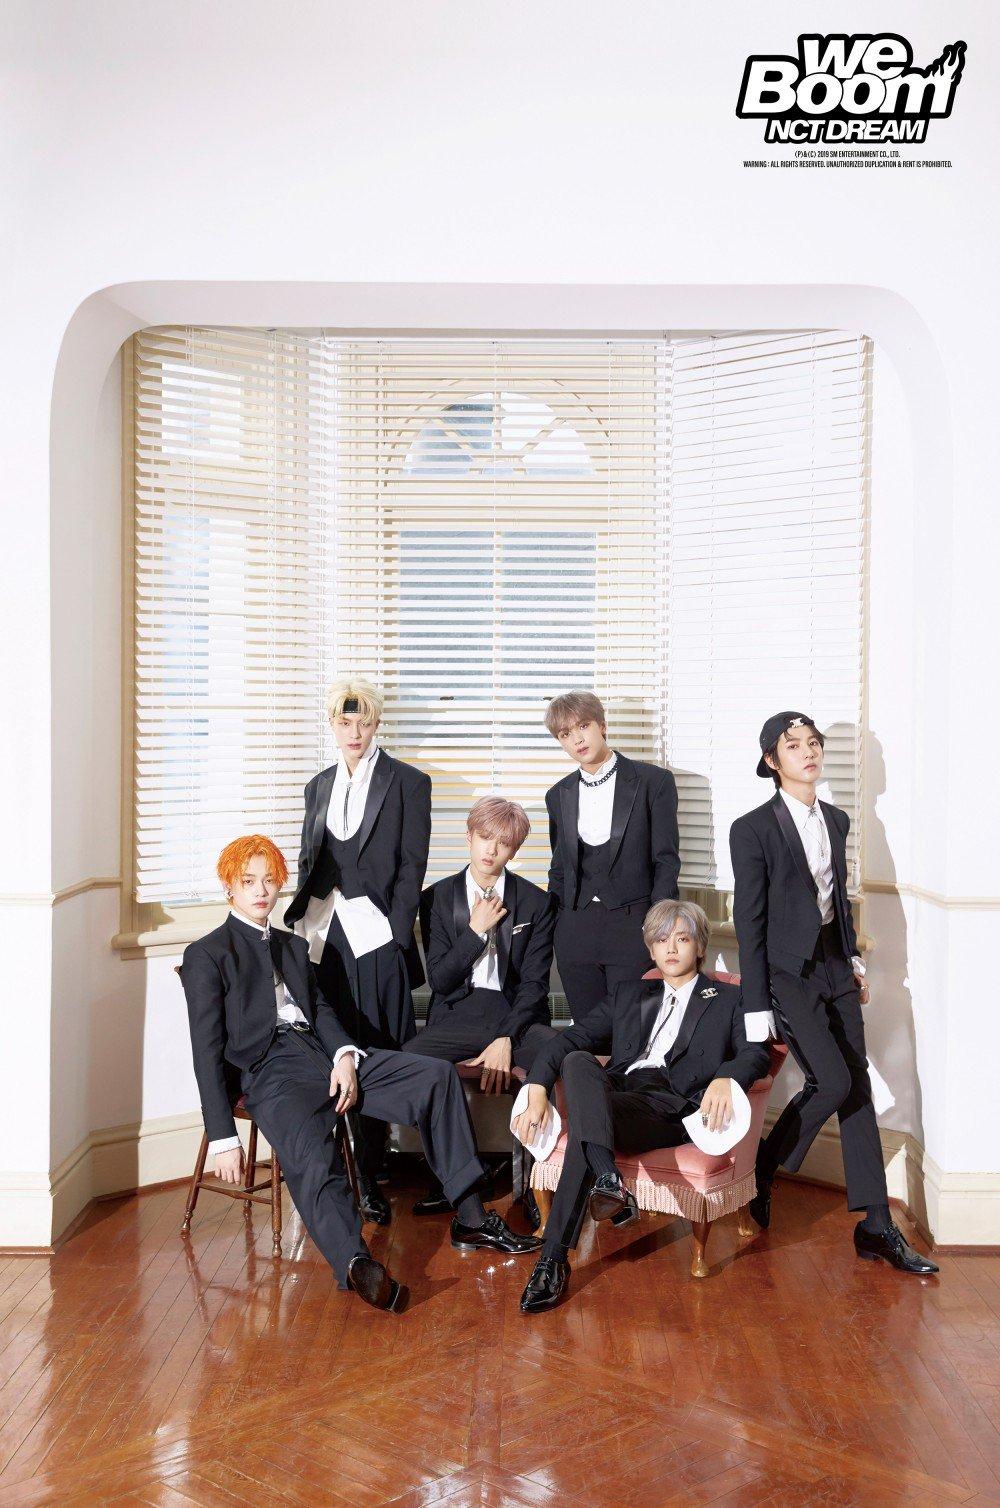 NCT DREAM 'We Boom - The 3rd Mini Album' tops Gaon Retail